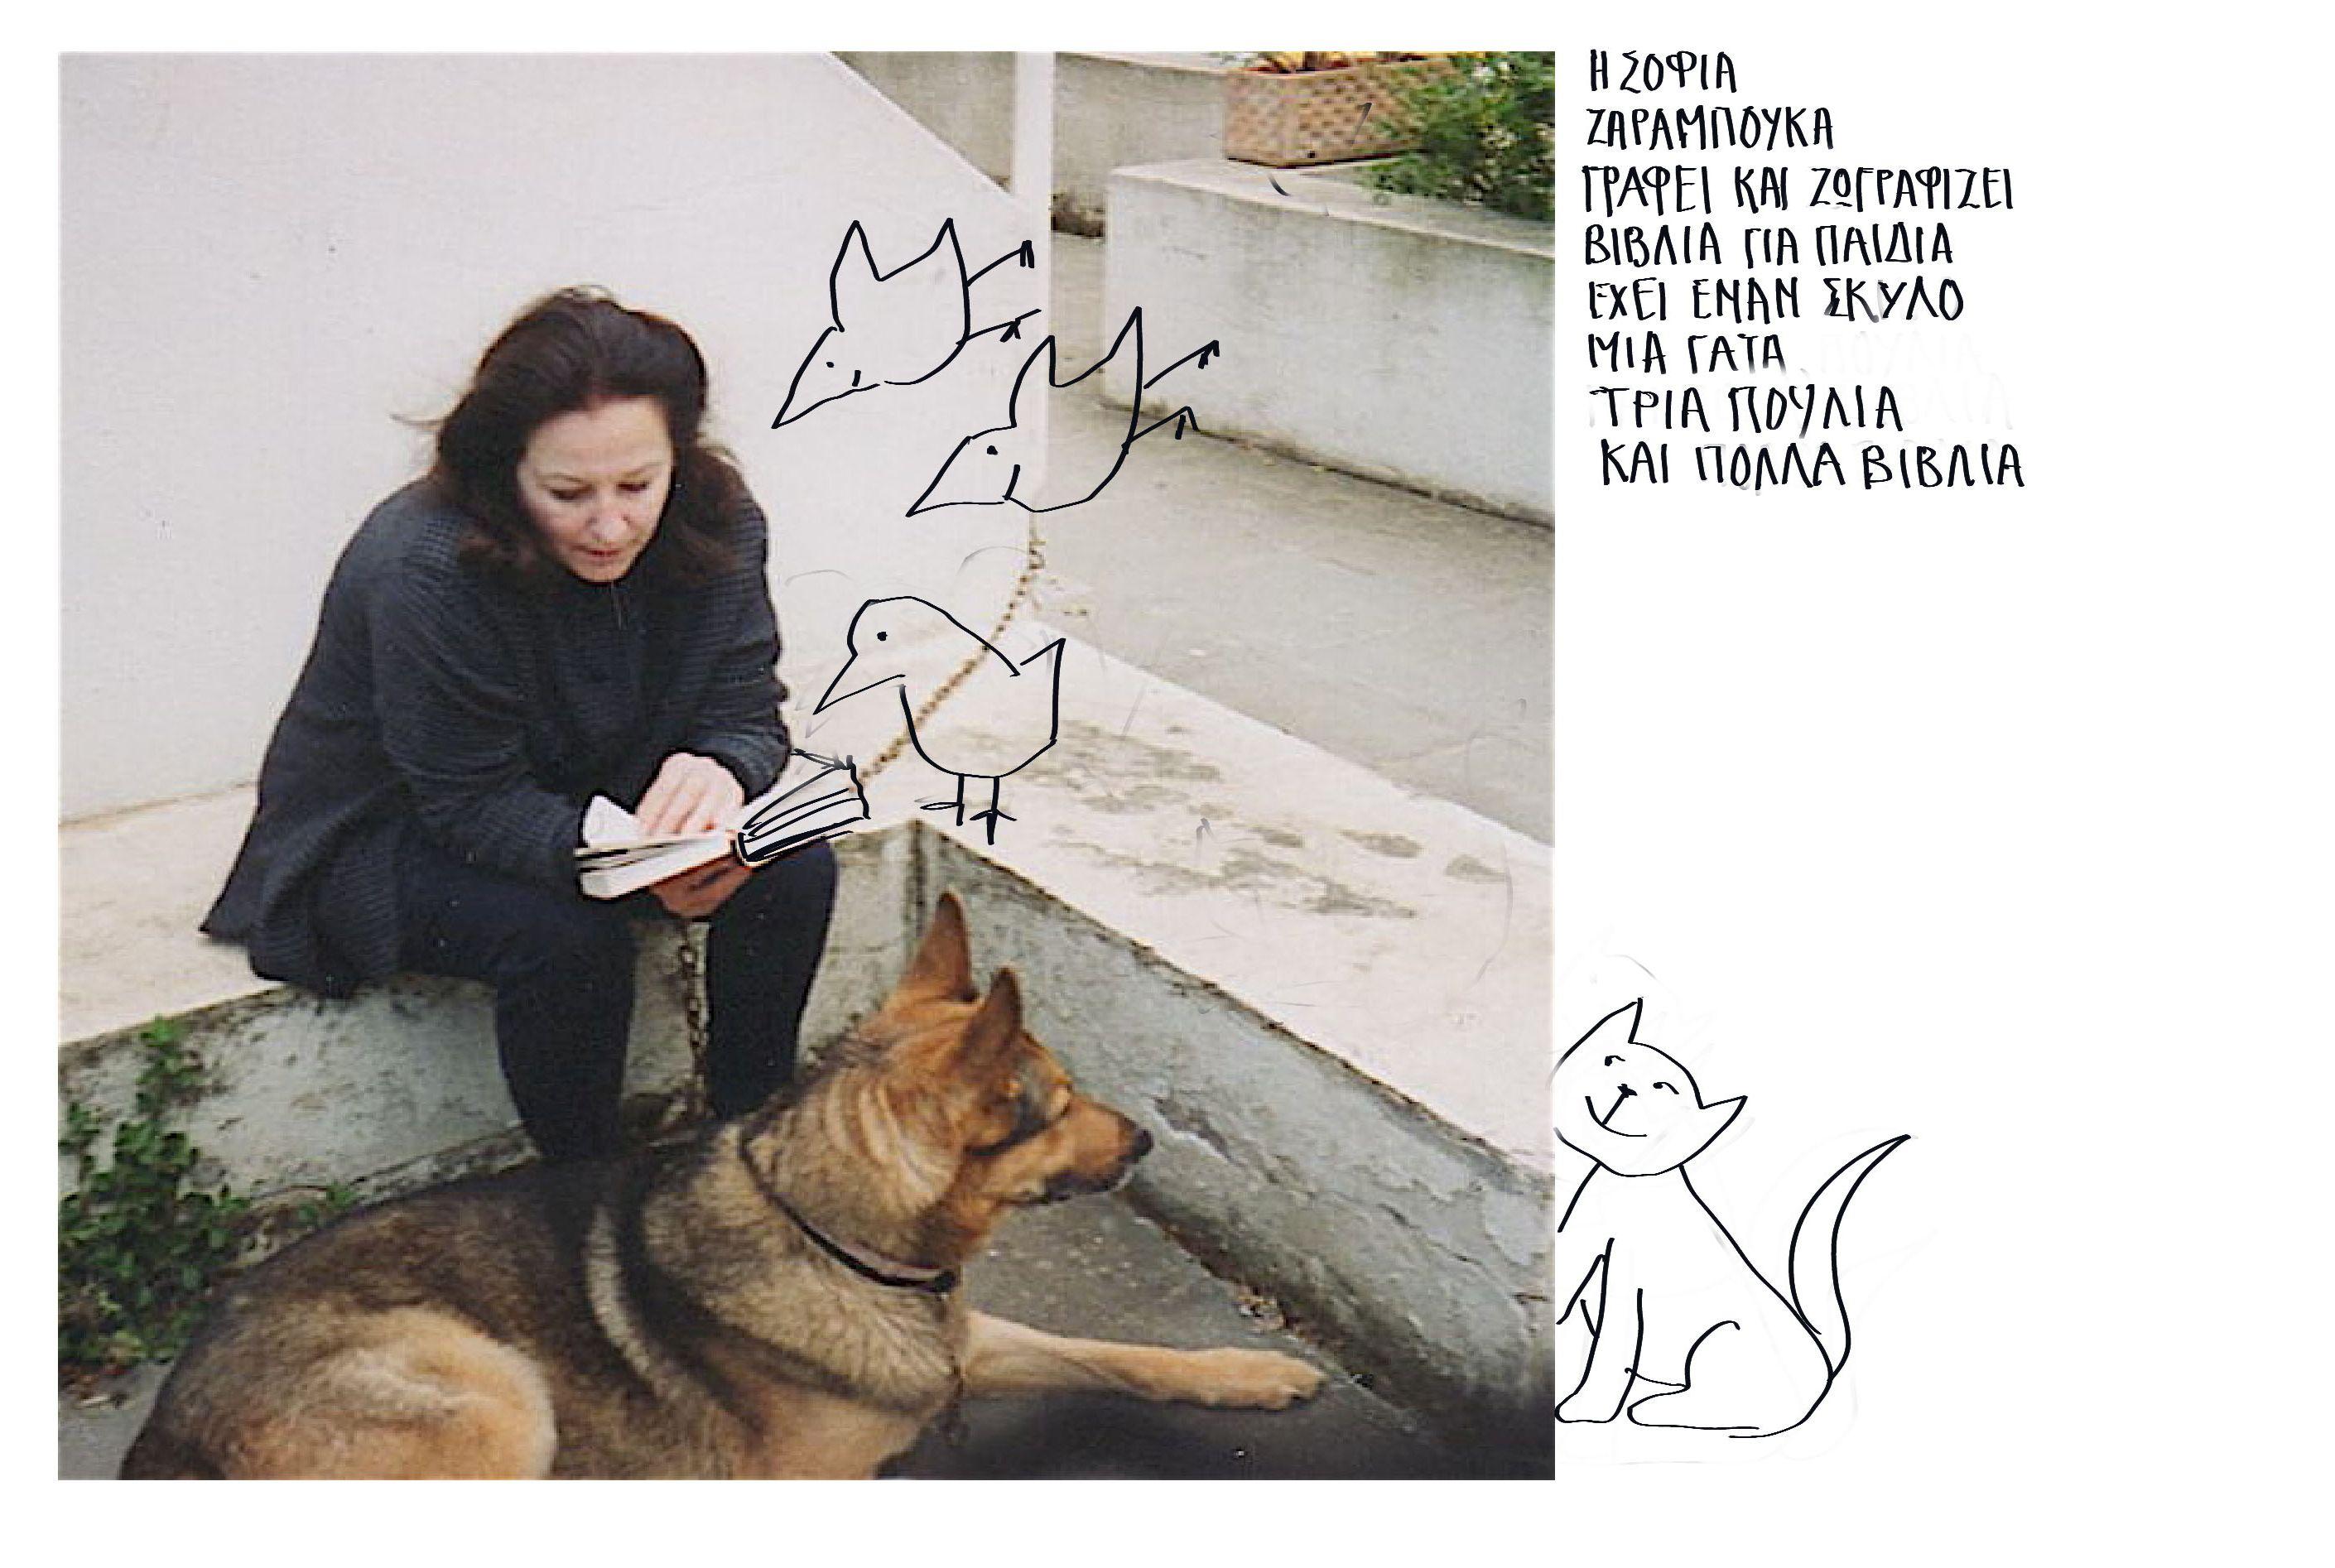 Foto_Zarabouka-Sofia